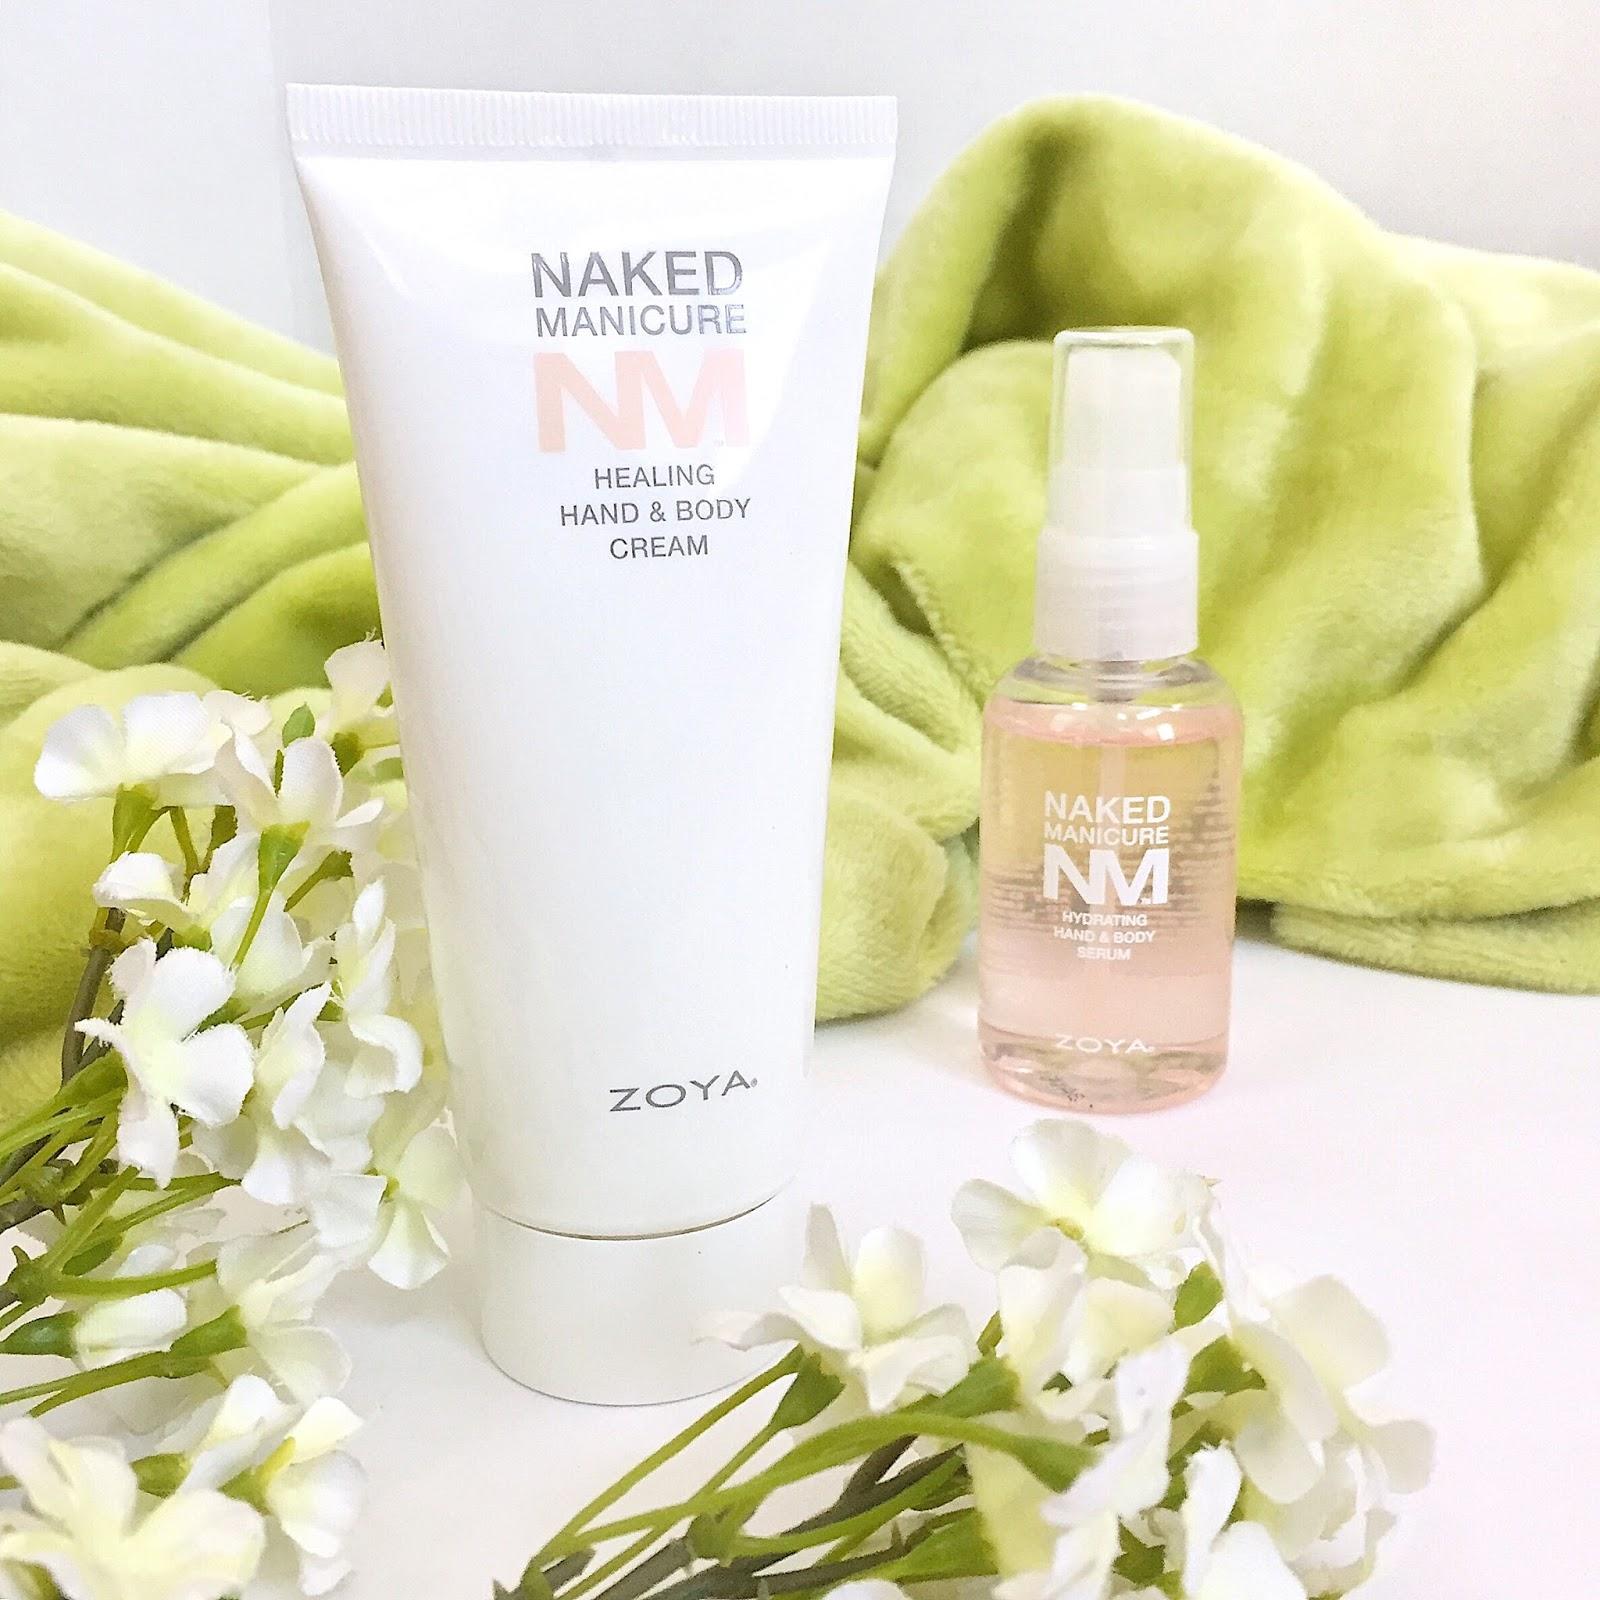 Zoya Naked Manicure Hand & Body Cream